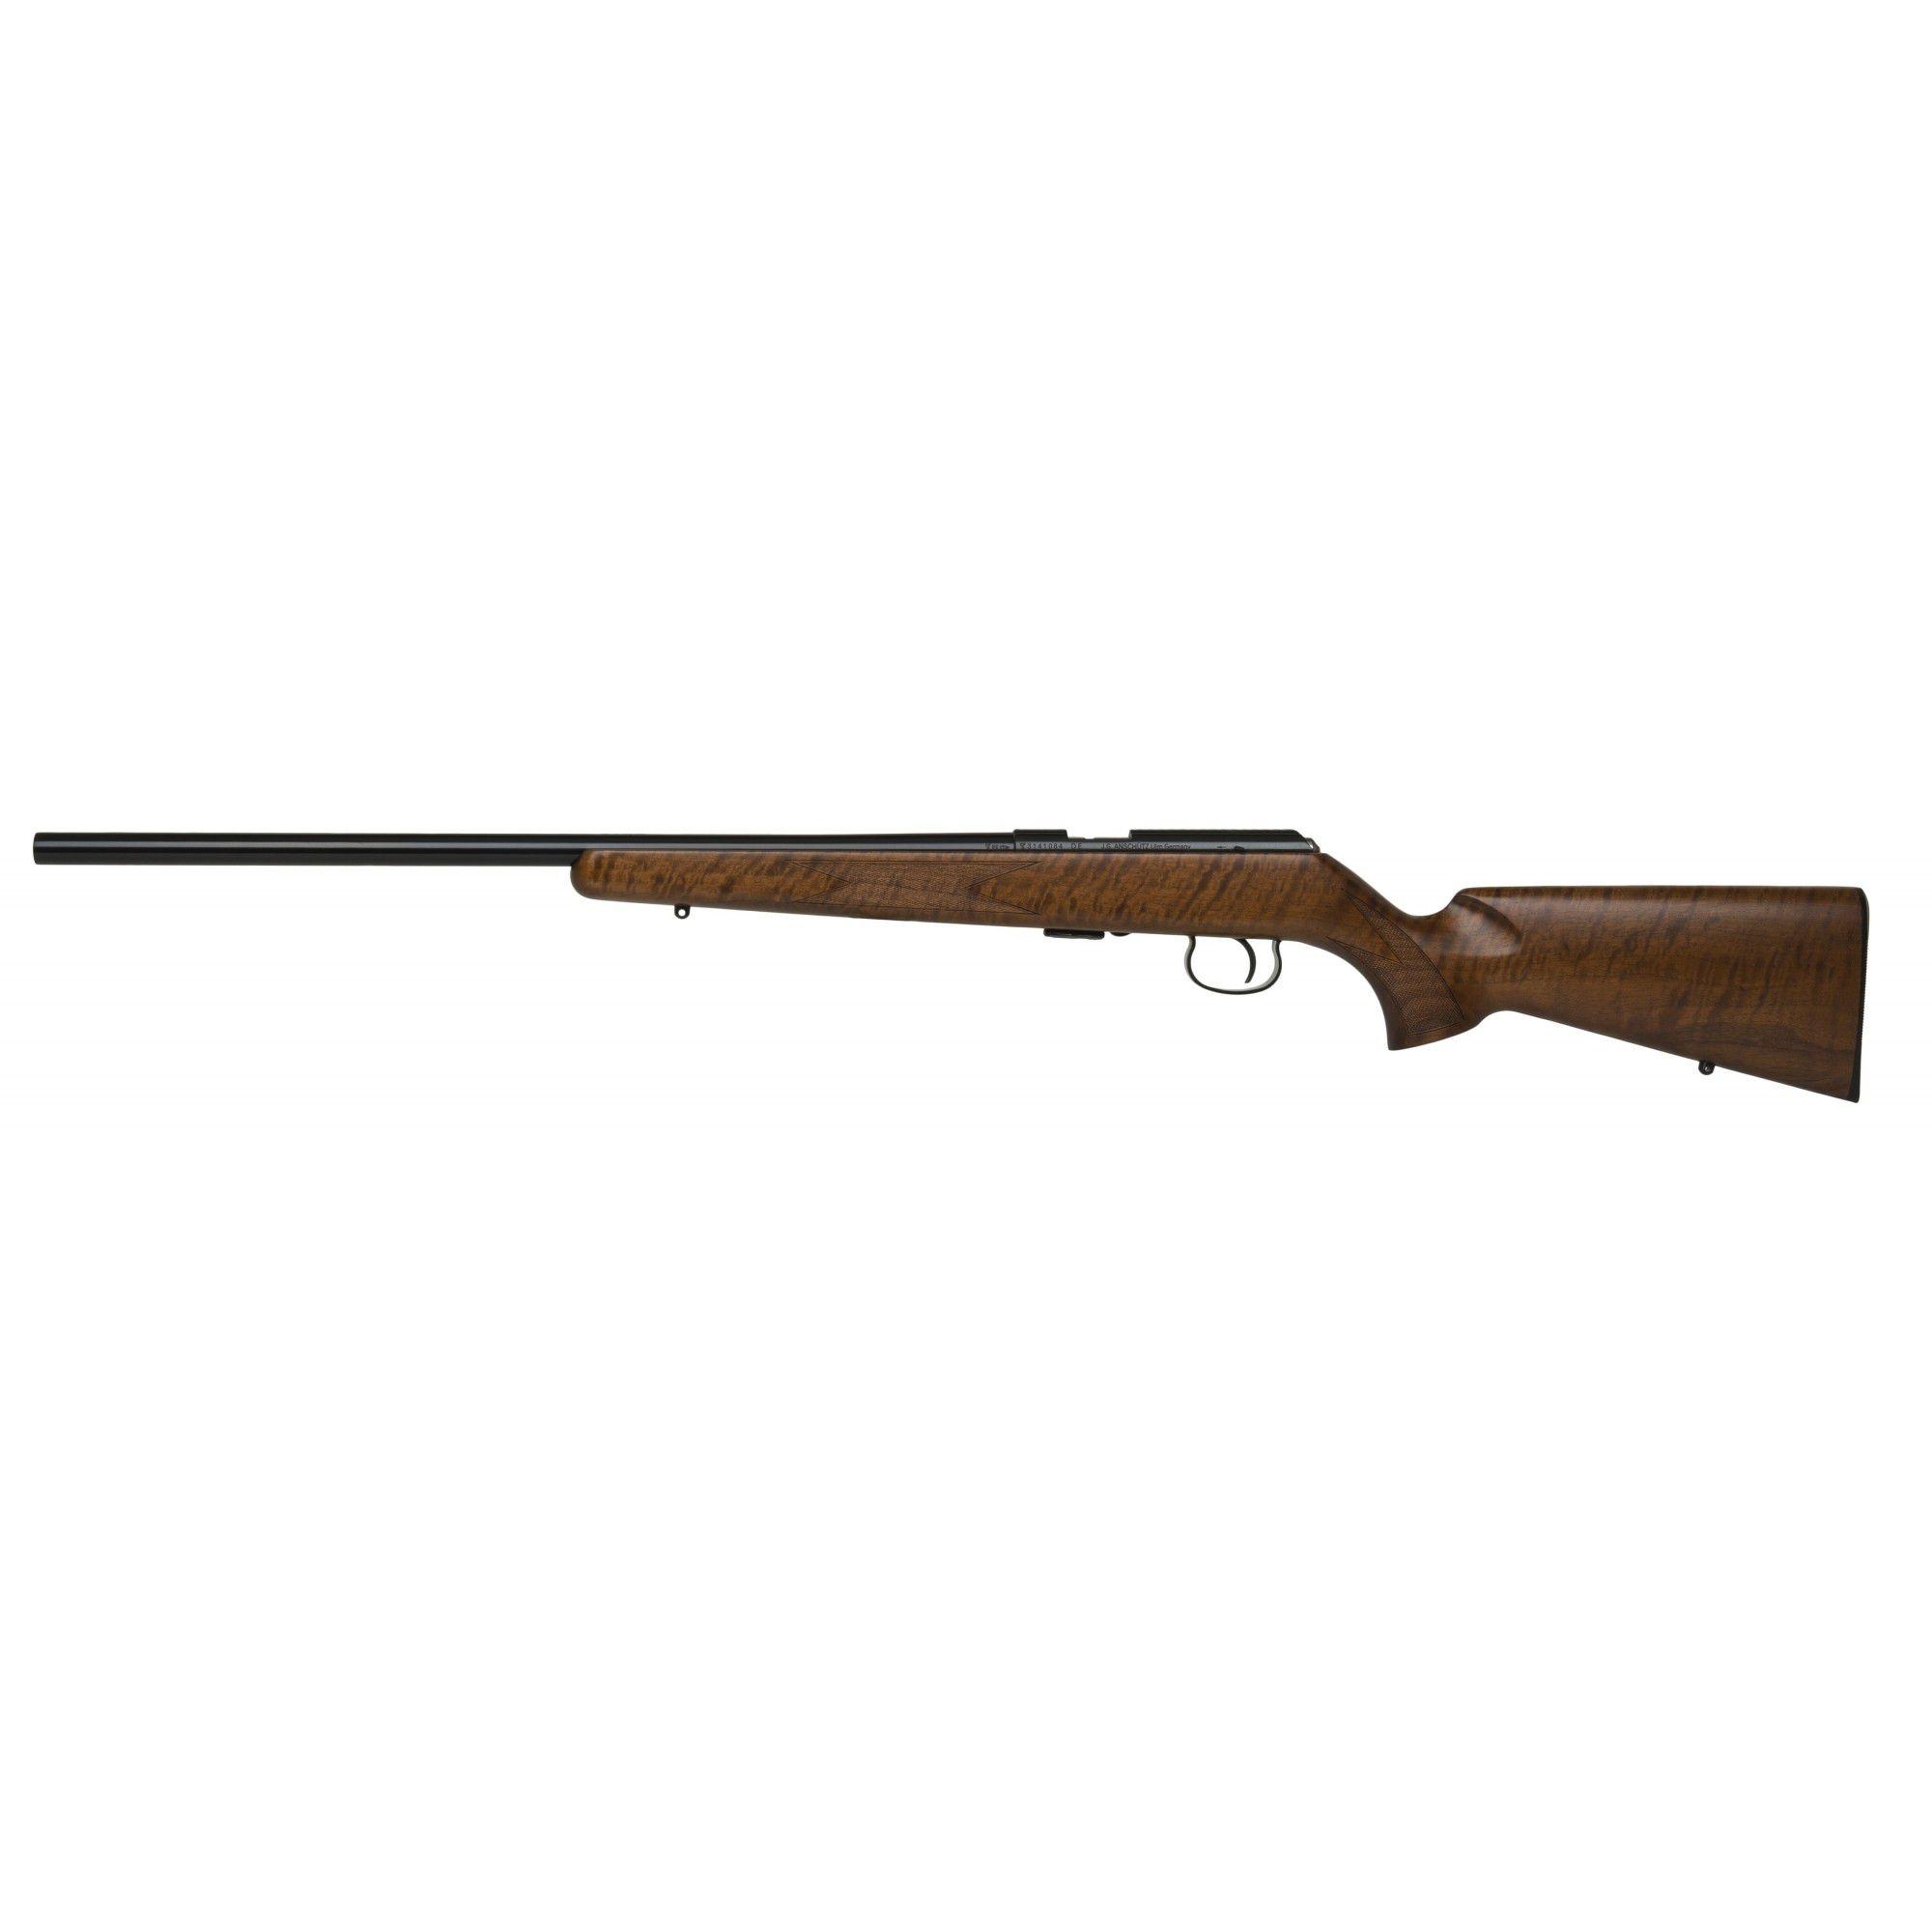 Anschutz - 1517 D HB Classic - Calibre .17 HMR  - Venda Exclusiva Para CAC